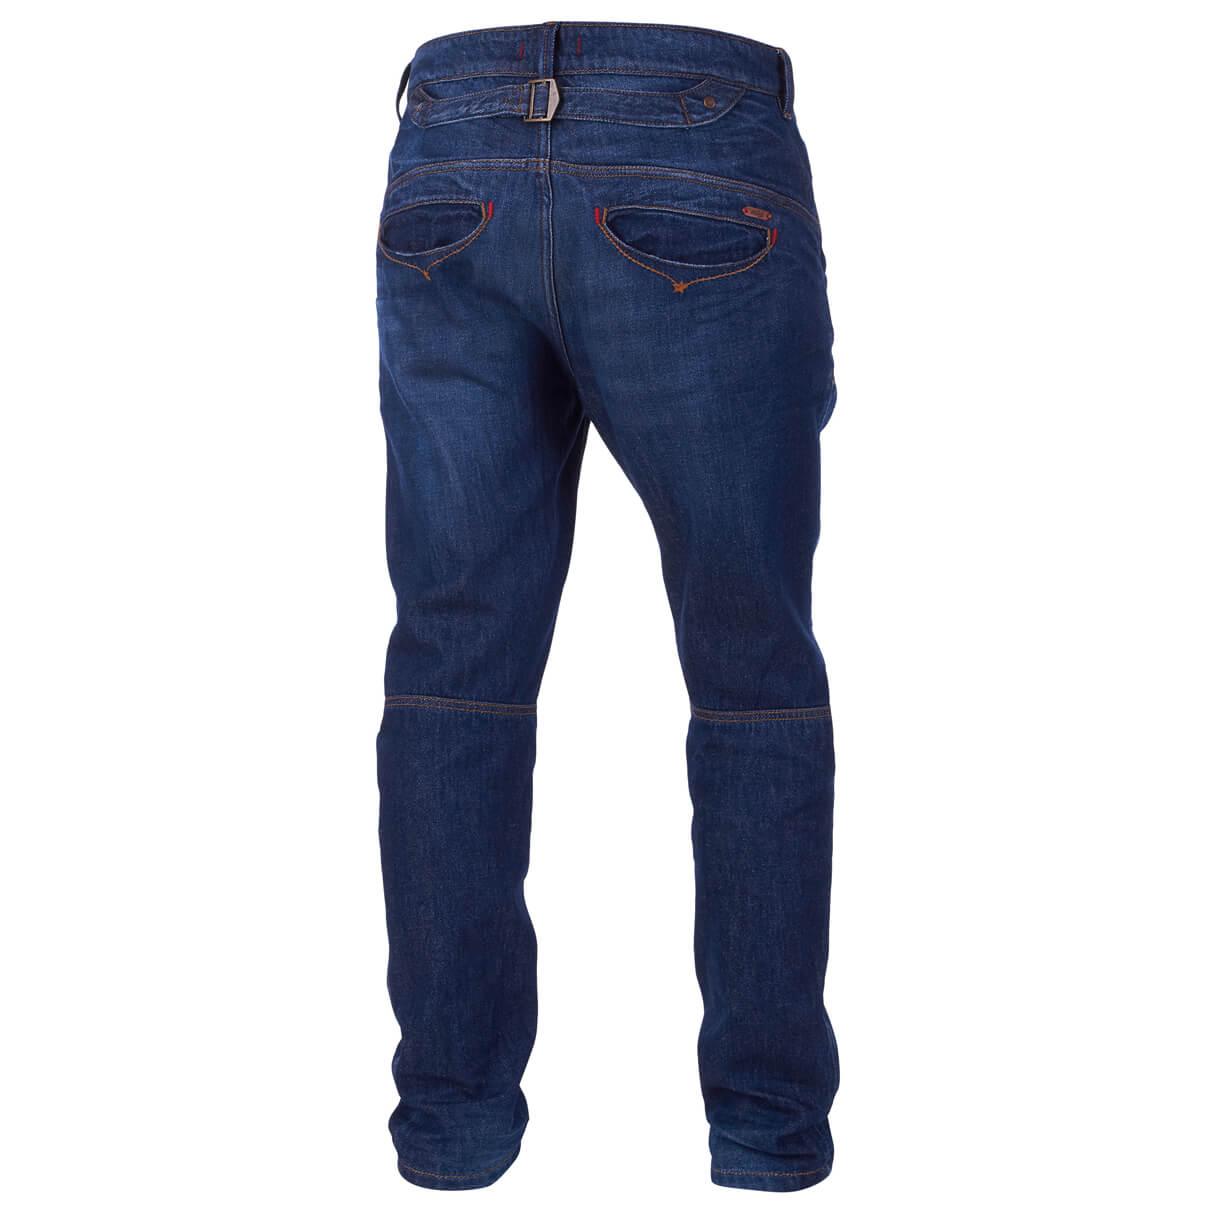 maloja clarnom jeans damen online kaufen. Black Bedroom Furniture Sets. Home Design Ideas